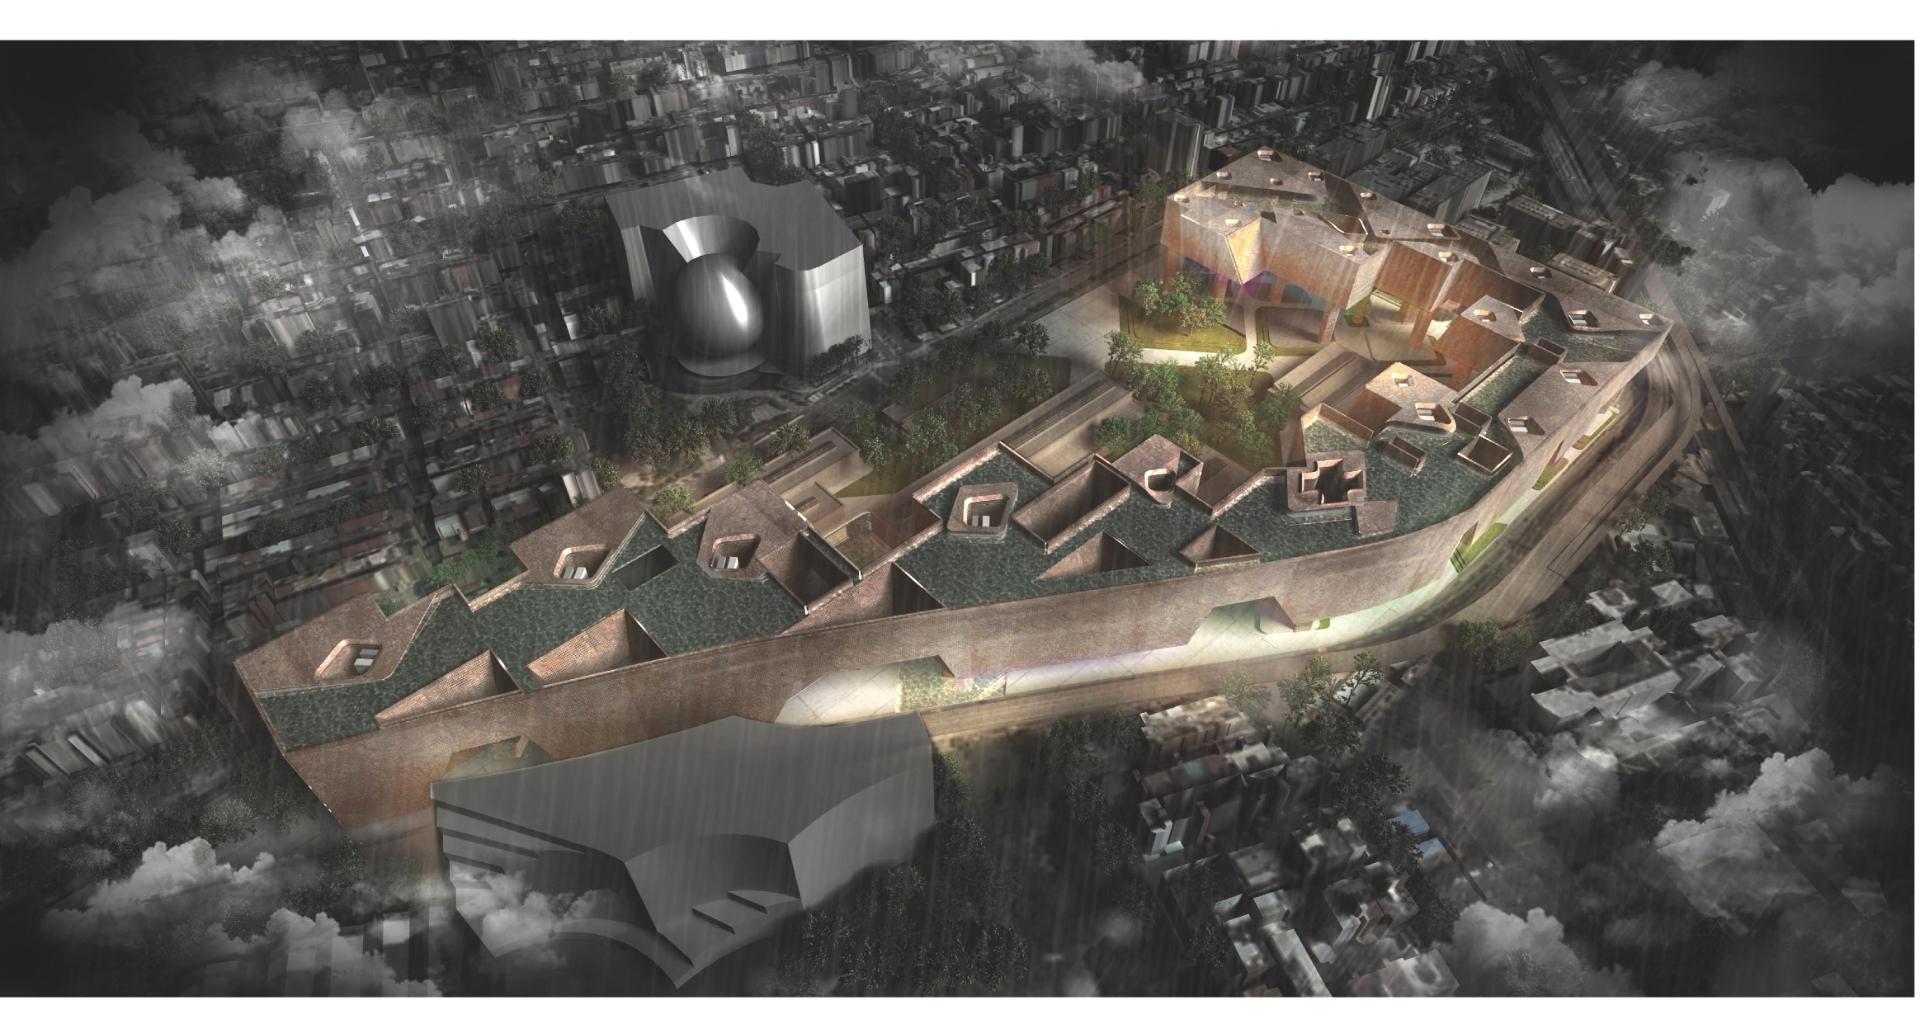 Enlarge Photo: Architecture & Urban Design II (ARCH 4002) 9